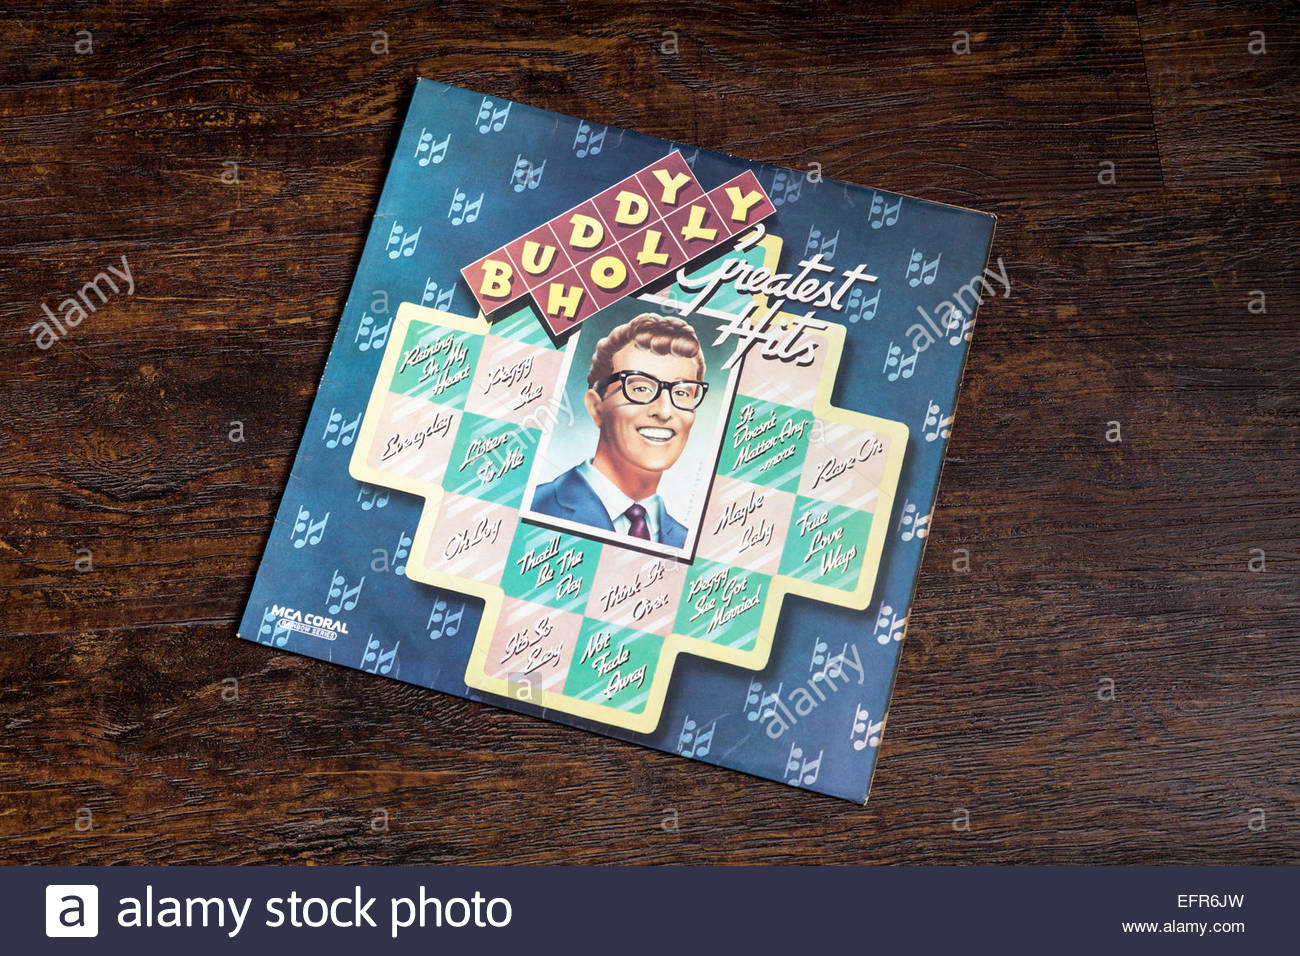 Buddy Holly Greatest Hits album - Stock Image